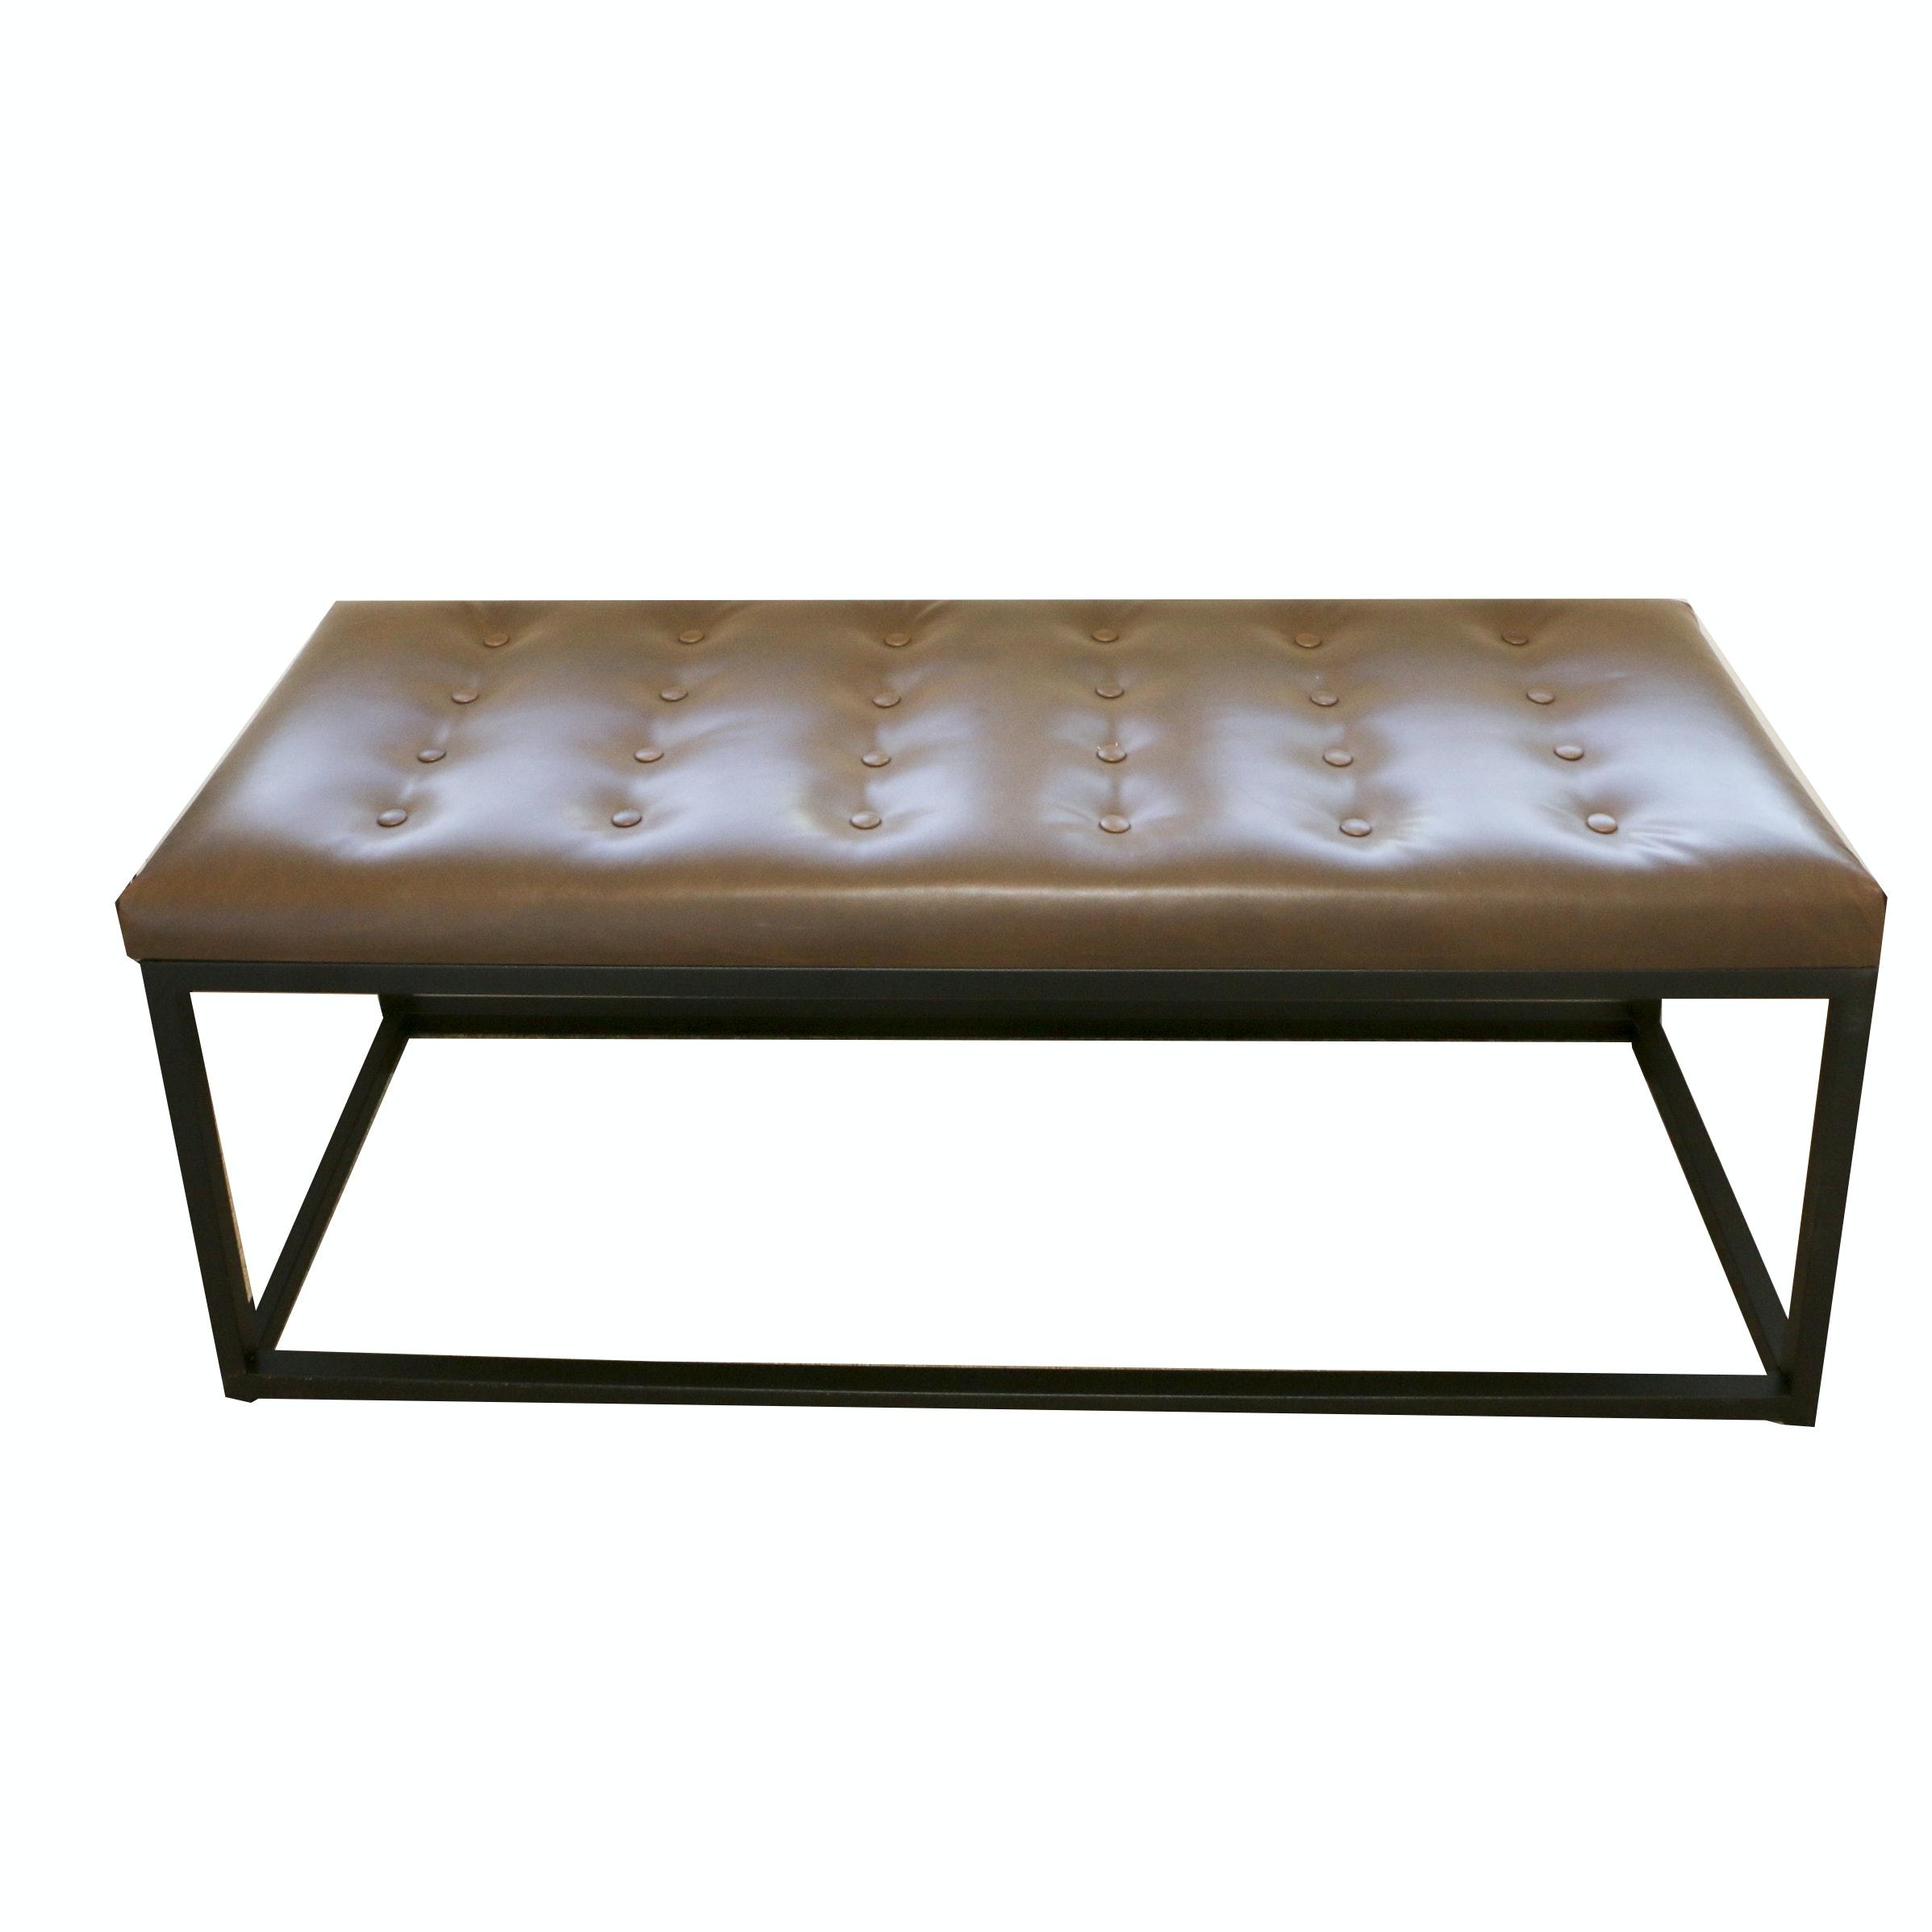 Tufted Vinyl Upholstered Metal Bench, 21st Century